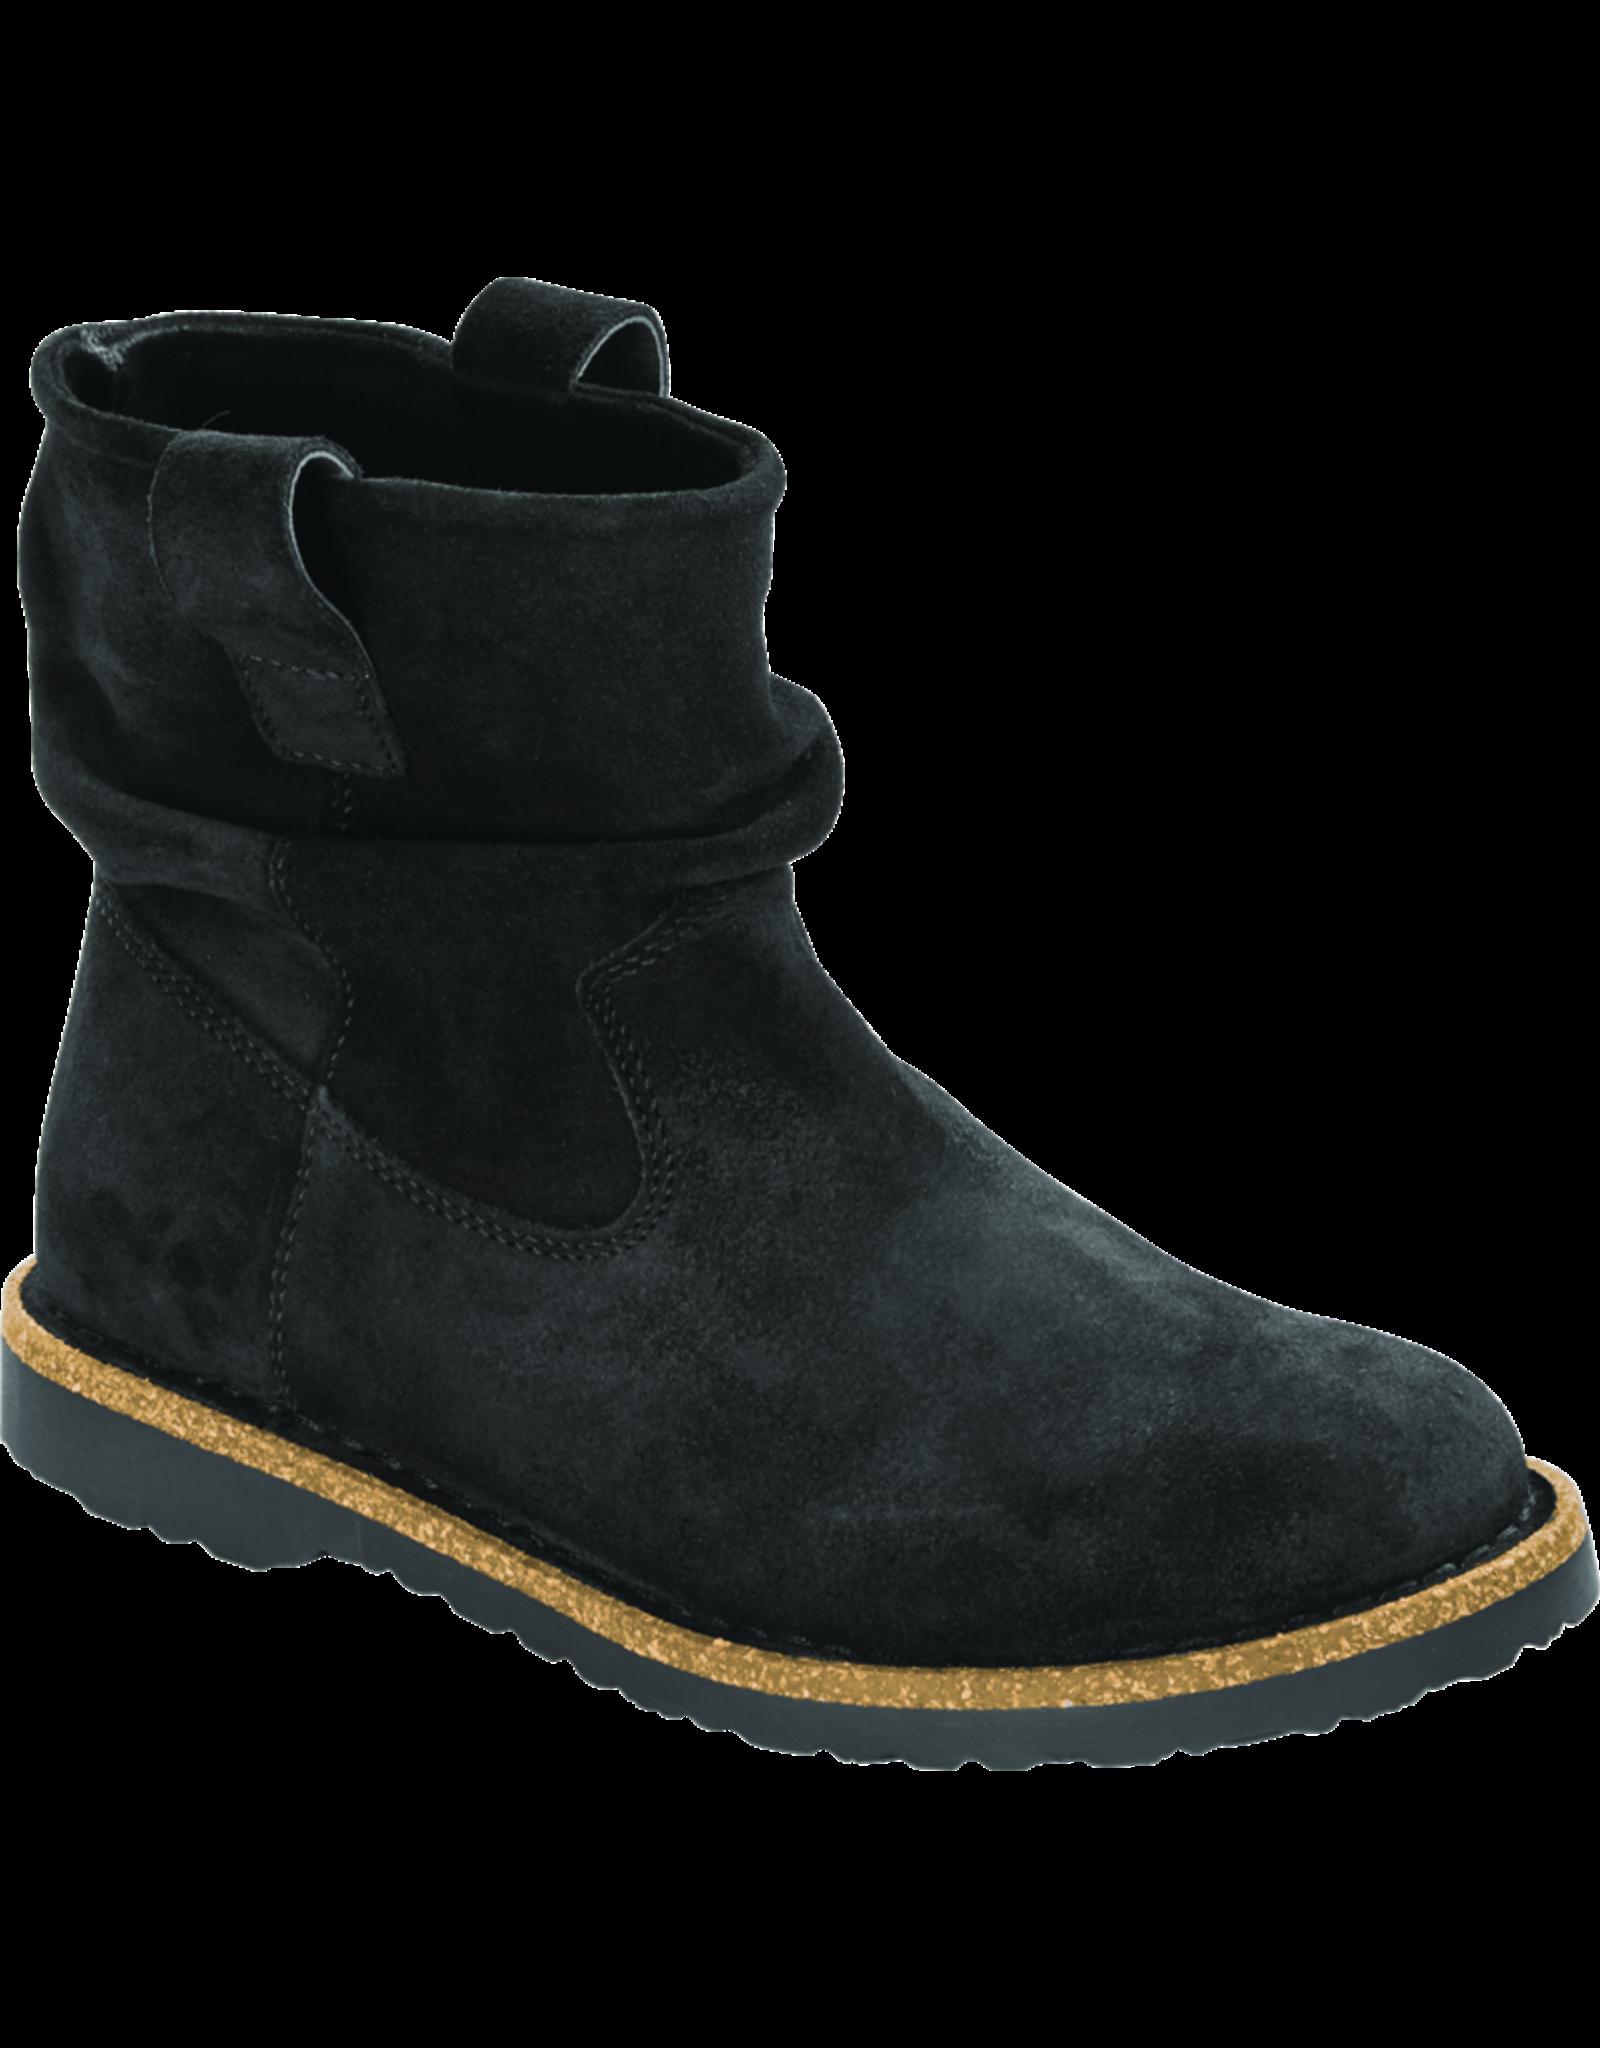 Birkenstock Luton Short Boot